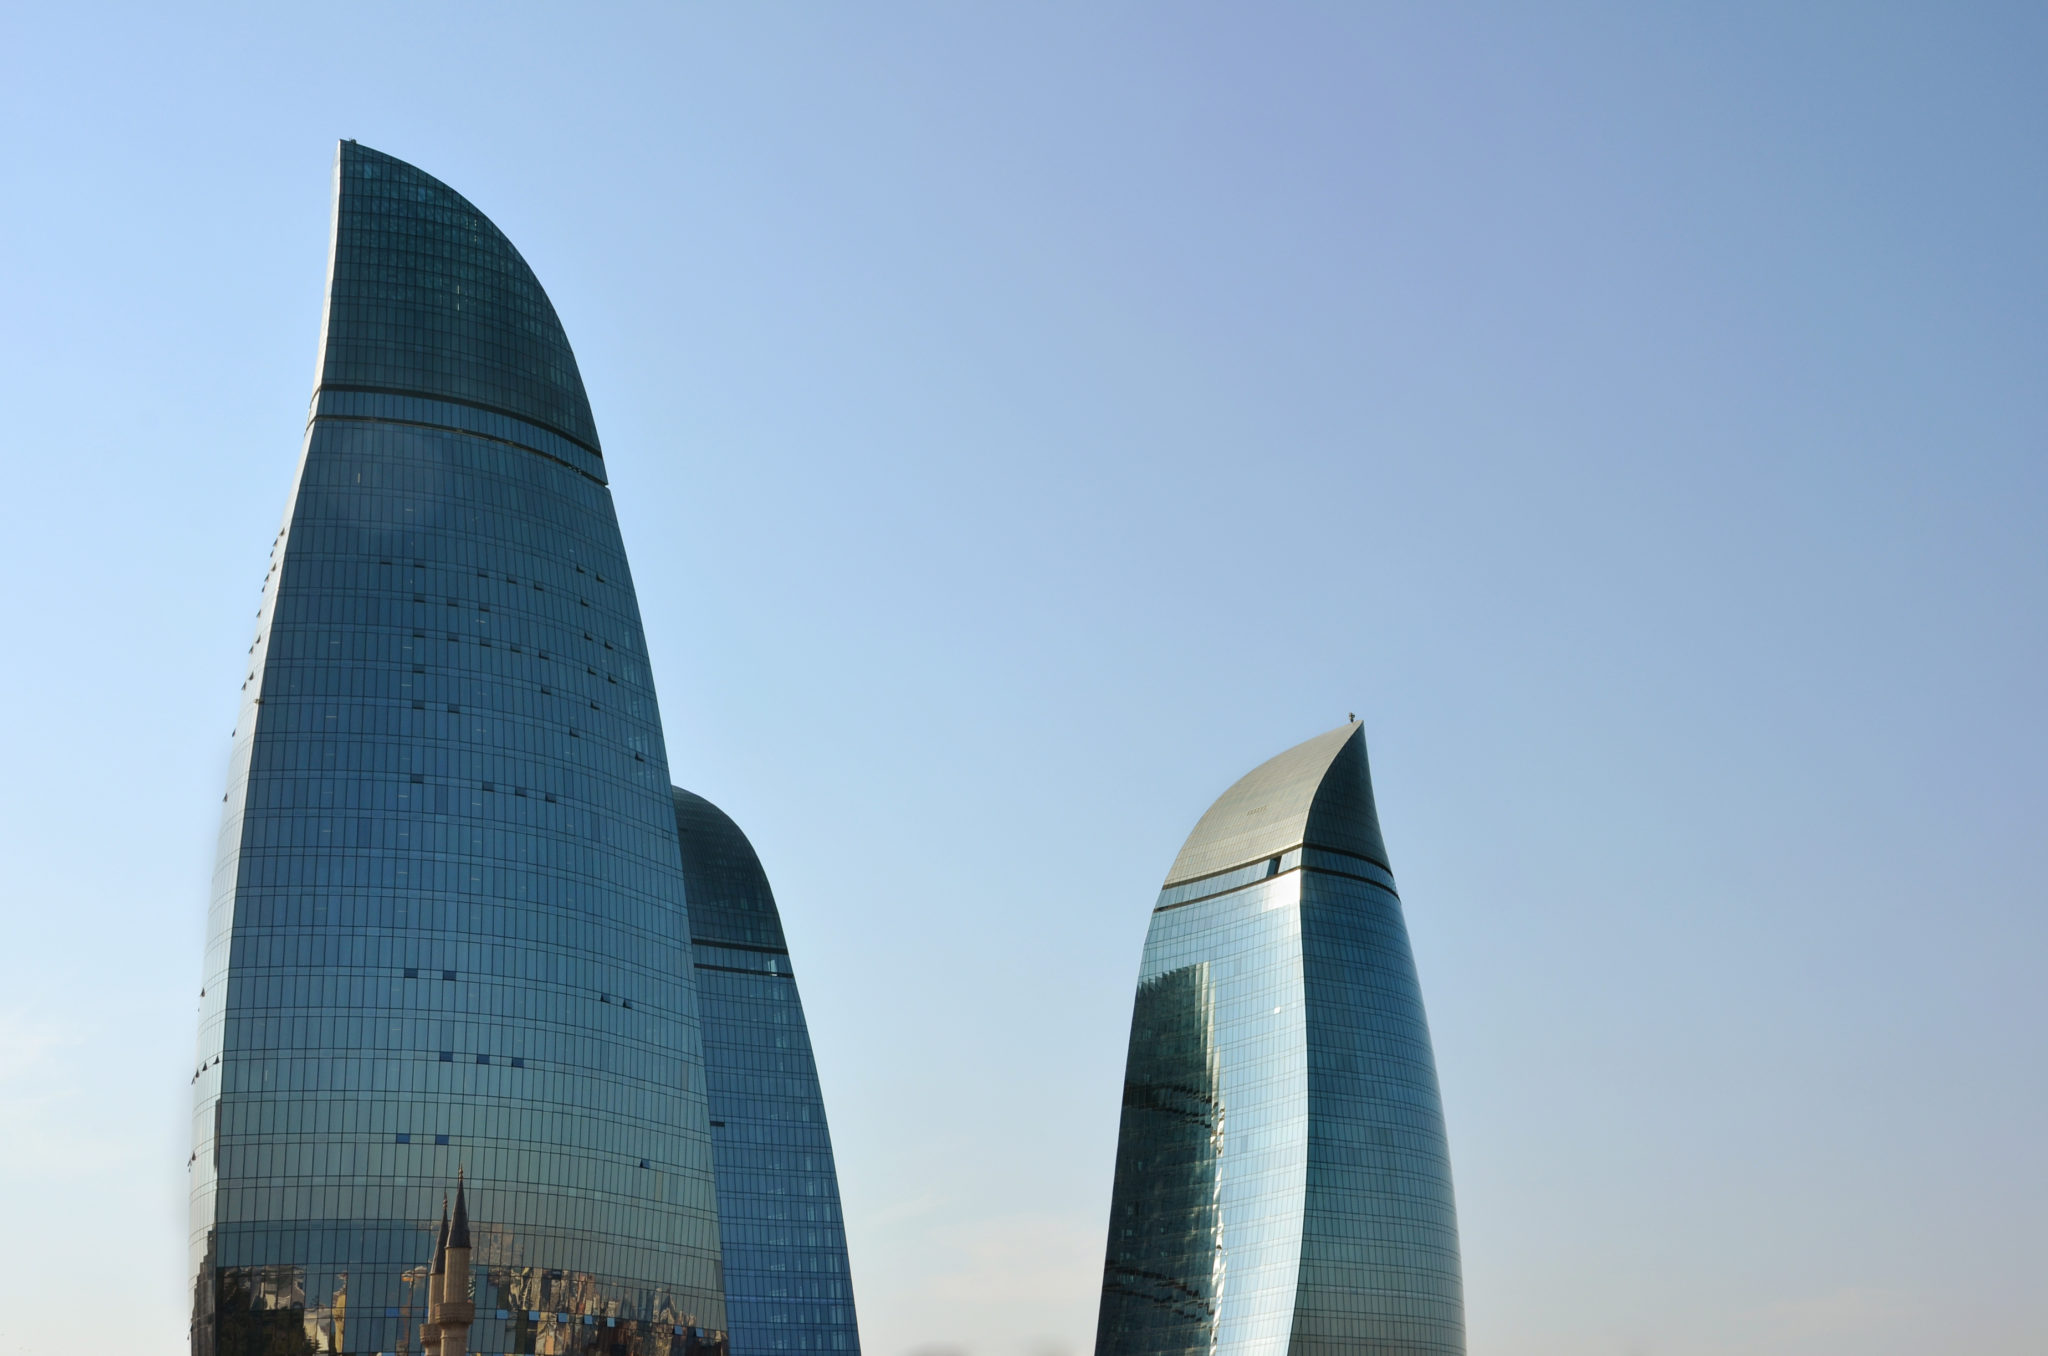 Visit-Azerbaijan-Flame-Towers-Baku